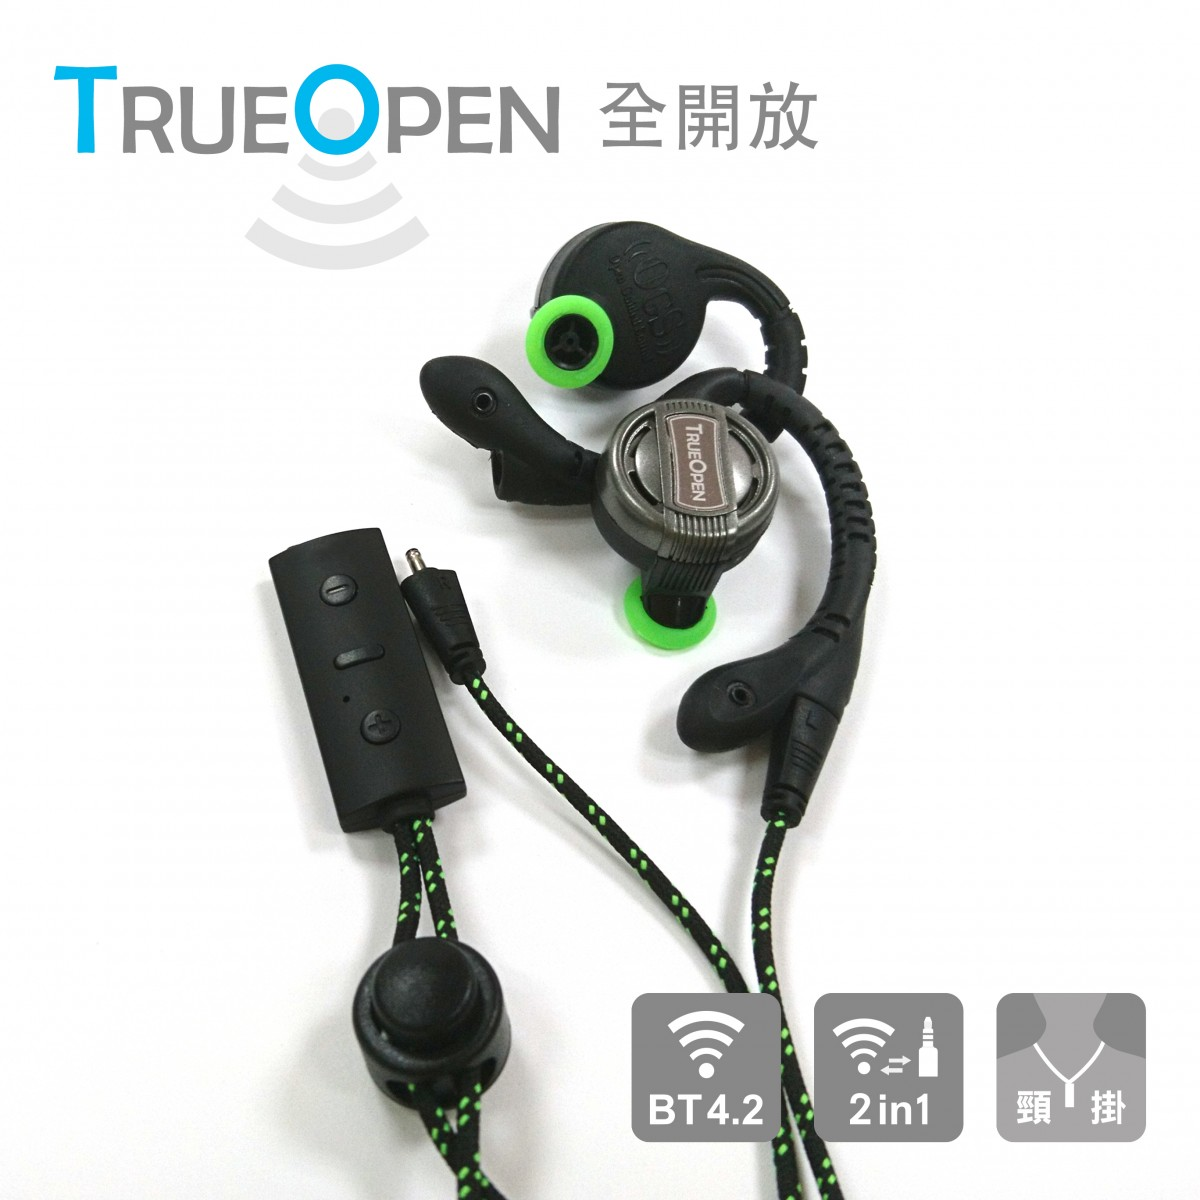 TOPlay聽不累 二合一藍牙耳機 螢光綠-防潑水 頸掛式 工作 運動 直播耳機-[BT001] - ★TrueOpen 頸掛式藍牙耳機★